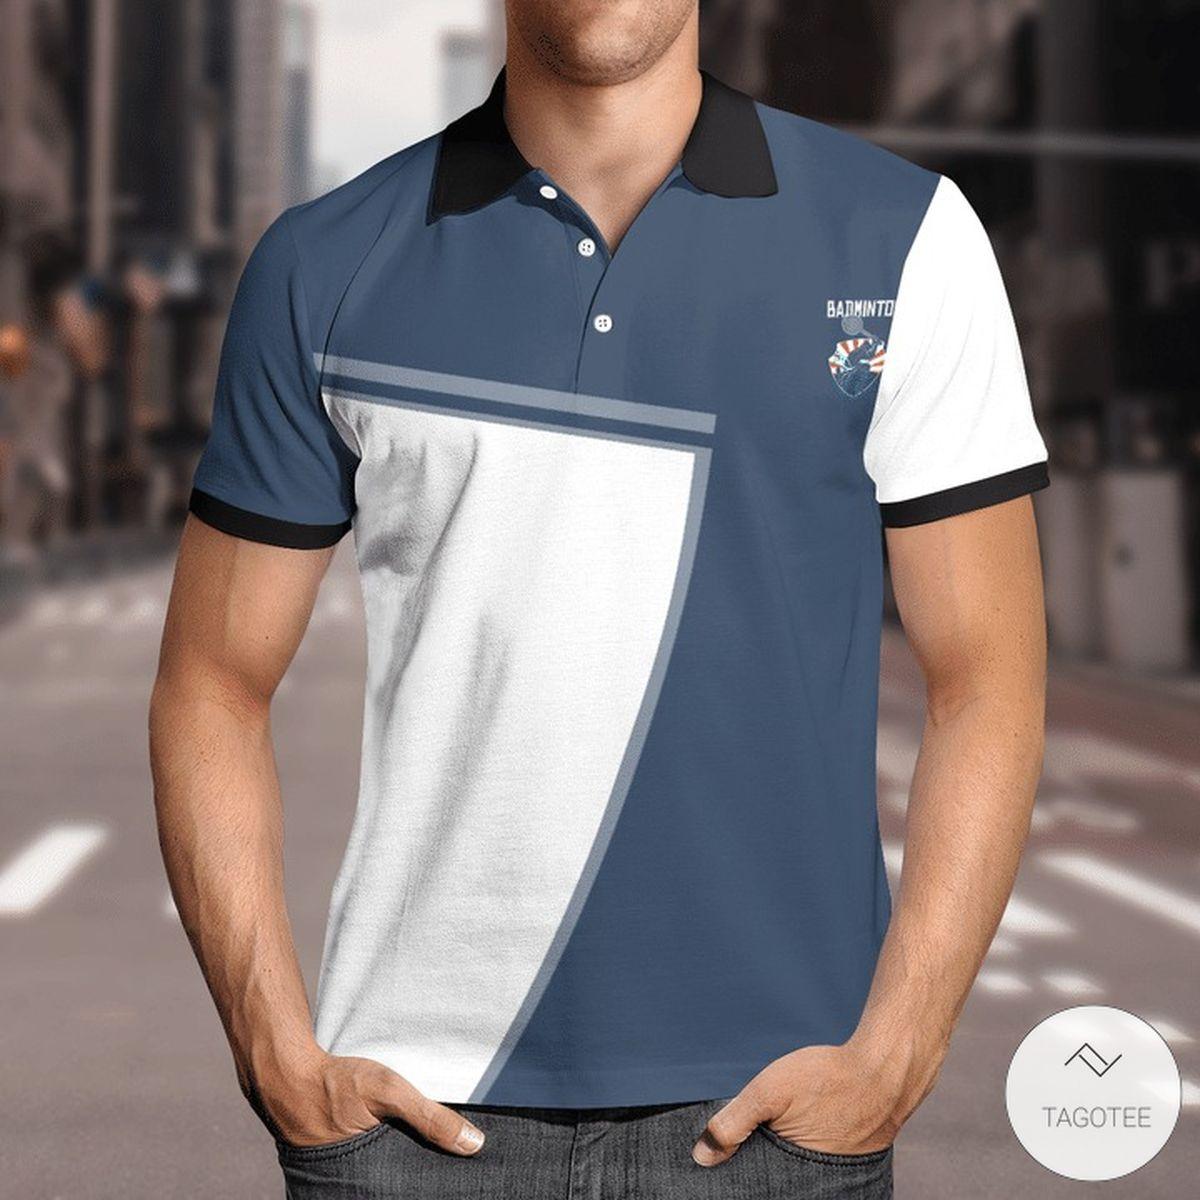 Badminton Racket Scientist Polo Shirt